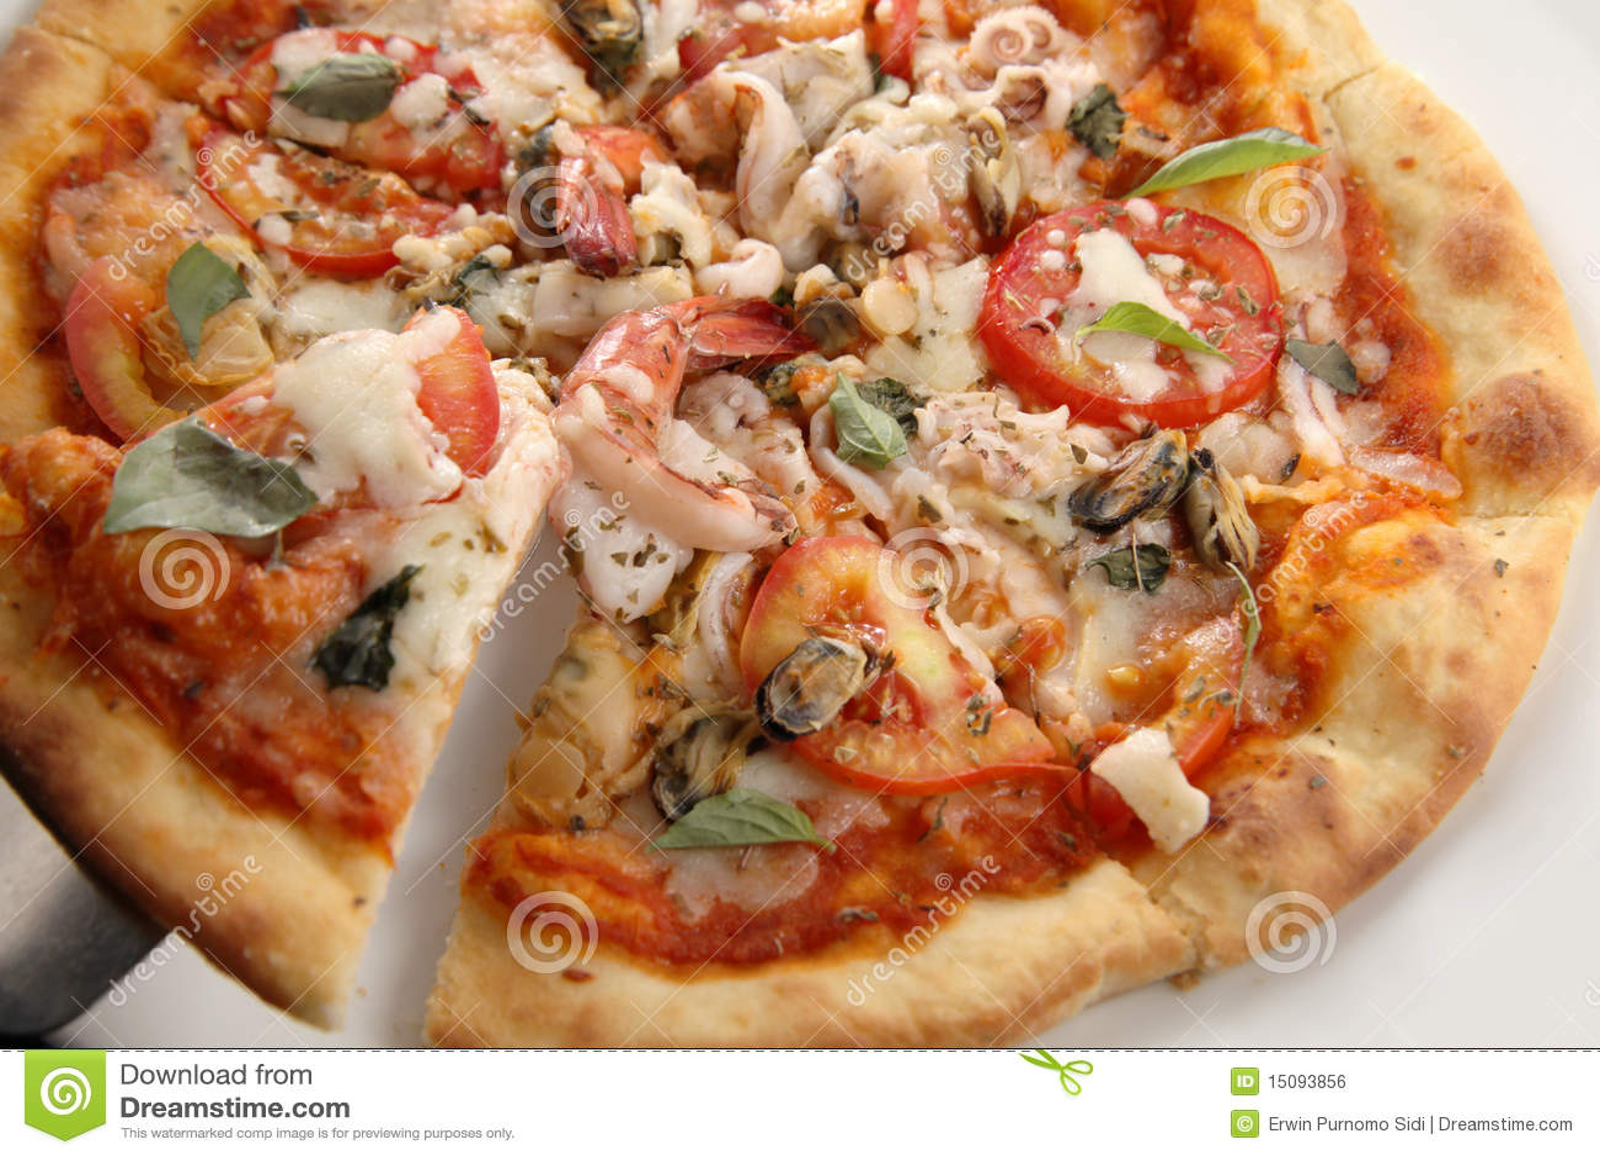 fruits de mer de pizza photo stock image du italien 15093856. Black Bedroom Furniture Sets. Home Design Ideas